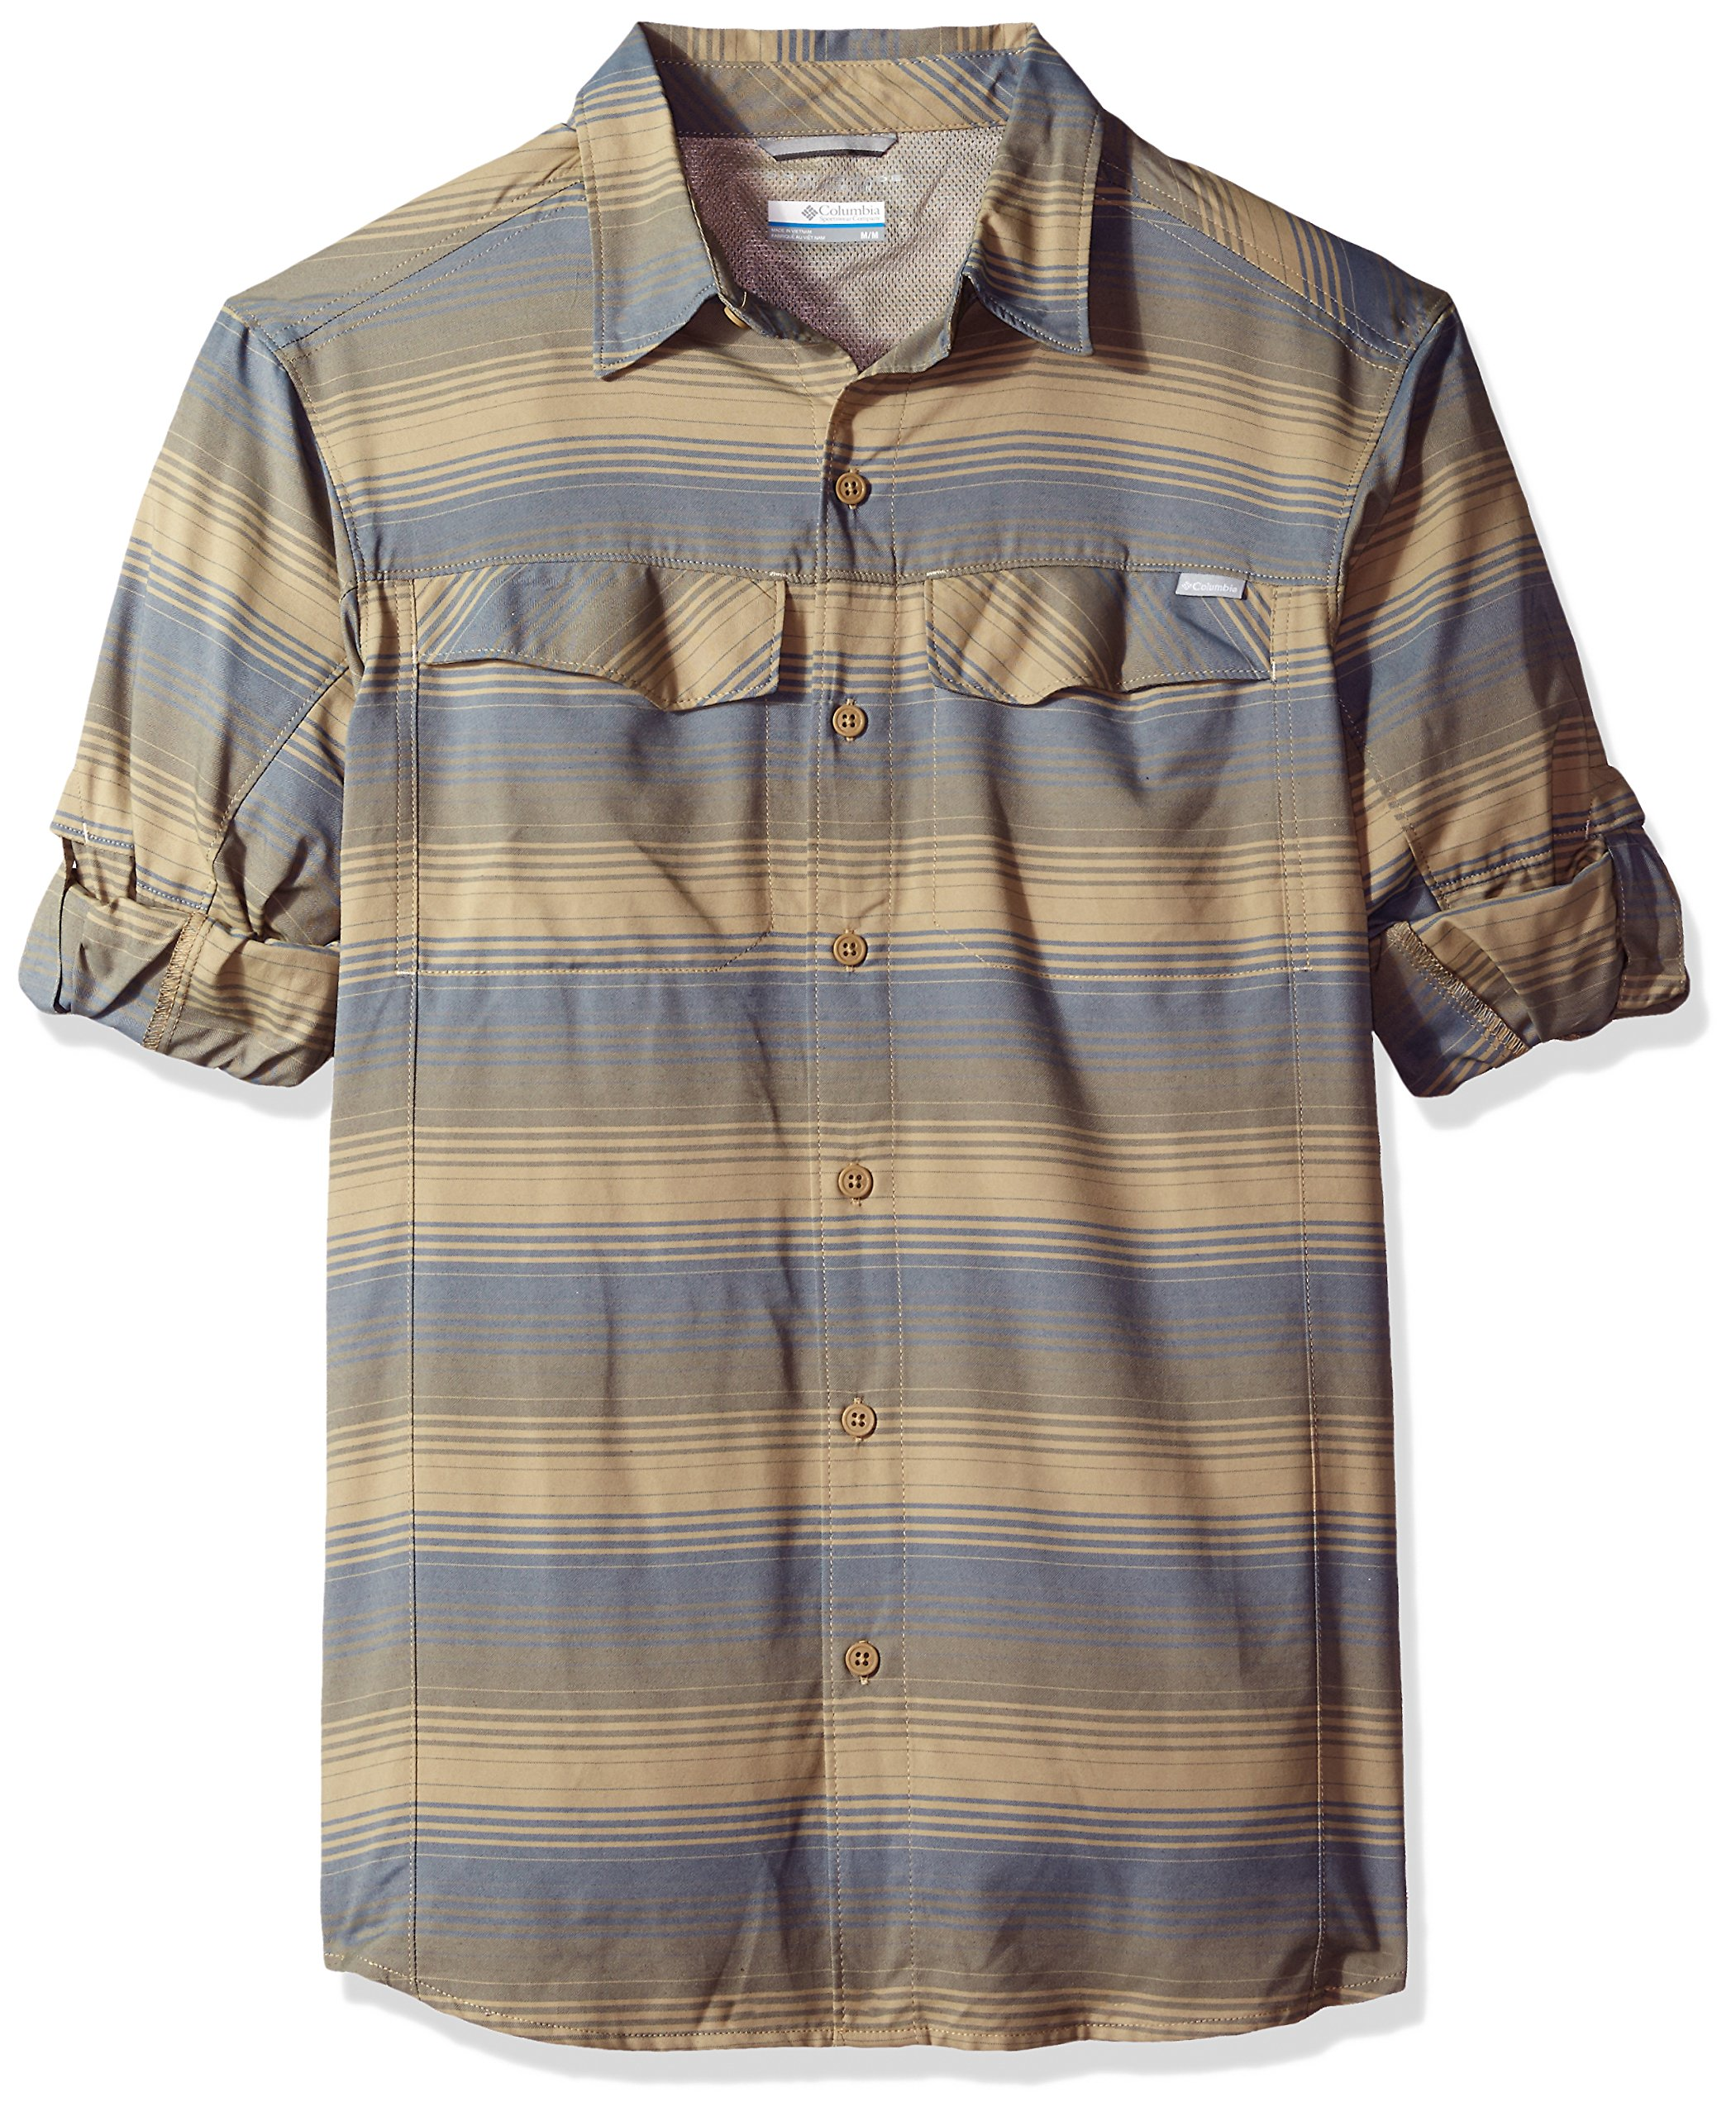 31f43b1d38b Galleon - Columbia Men's Silver Ridge Plaid Long Sleeve Shirt, Large, Major  Stripe